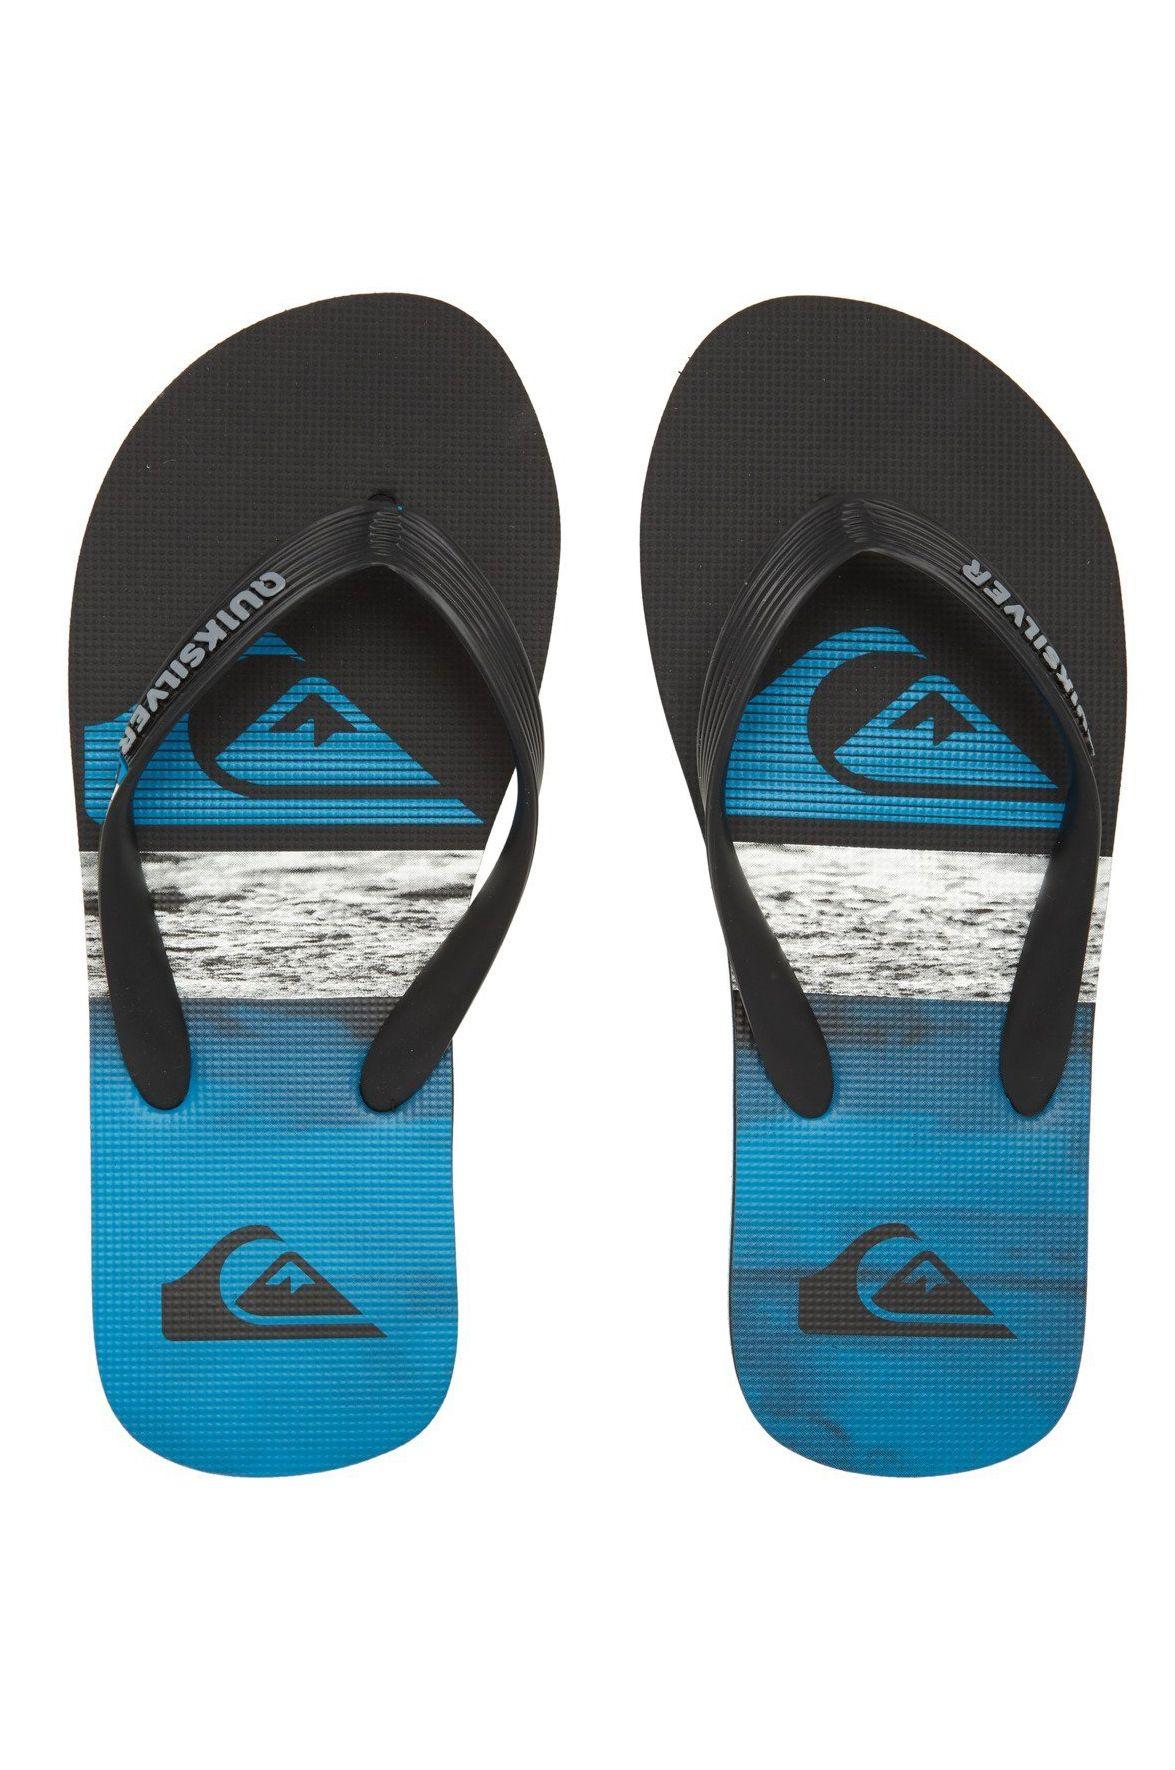 Quiksilver Sandals MOLO PANEL YTH B SNDL Black/Blue/Black